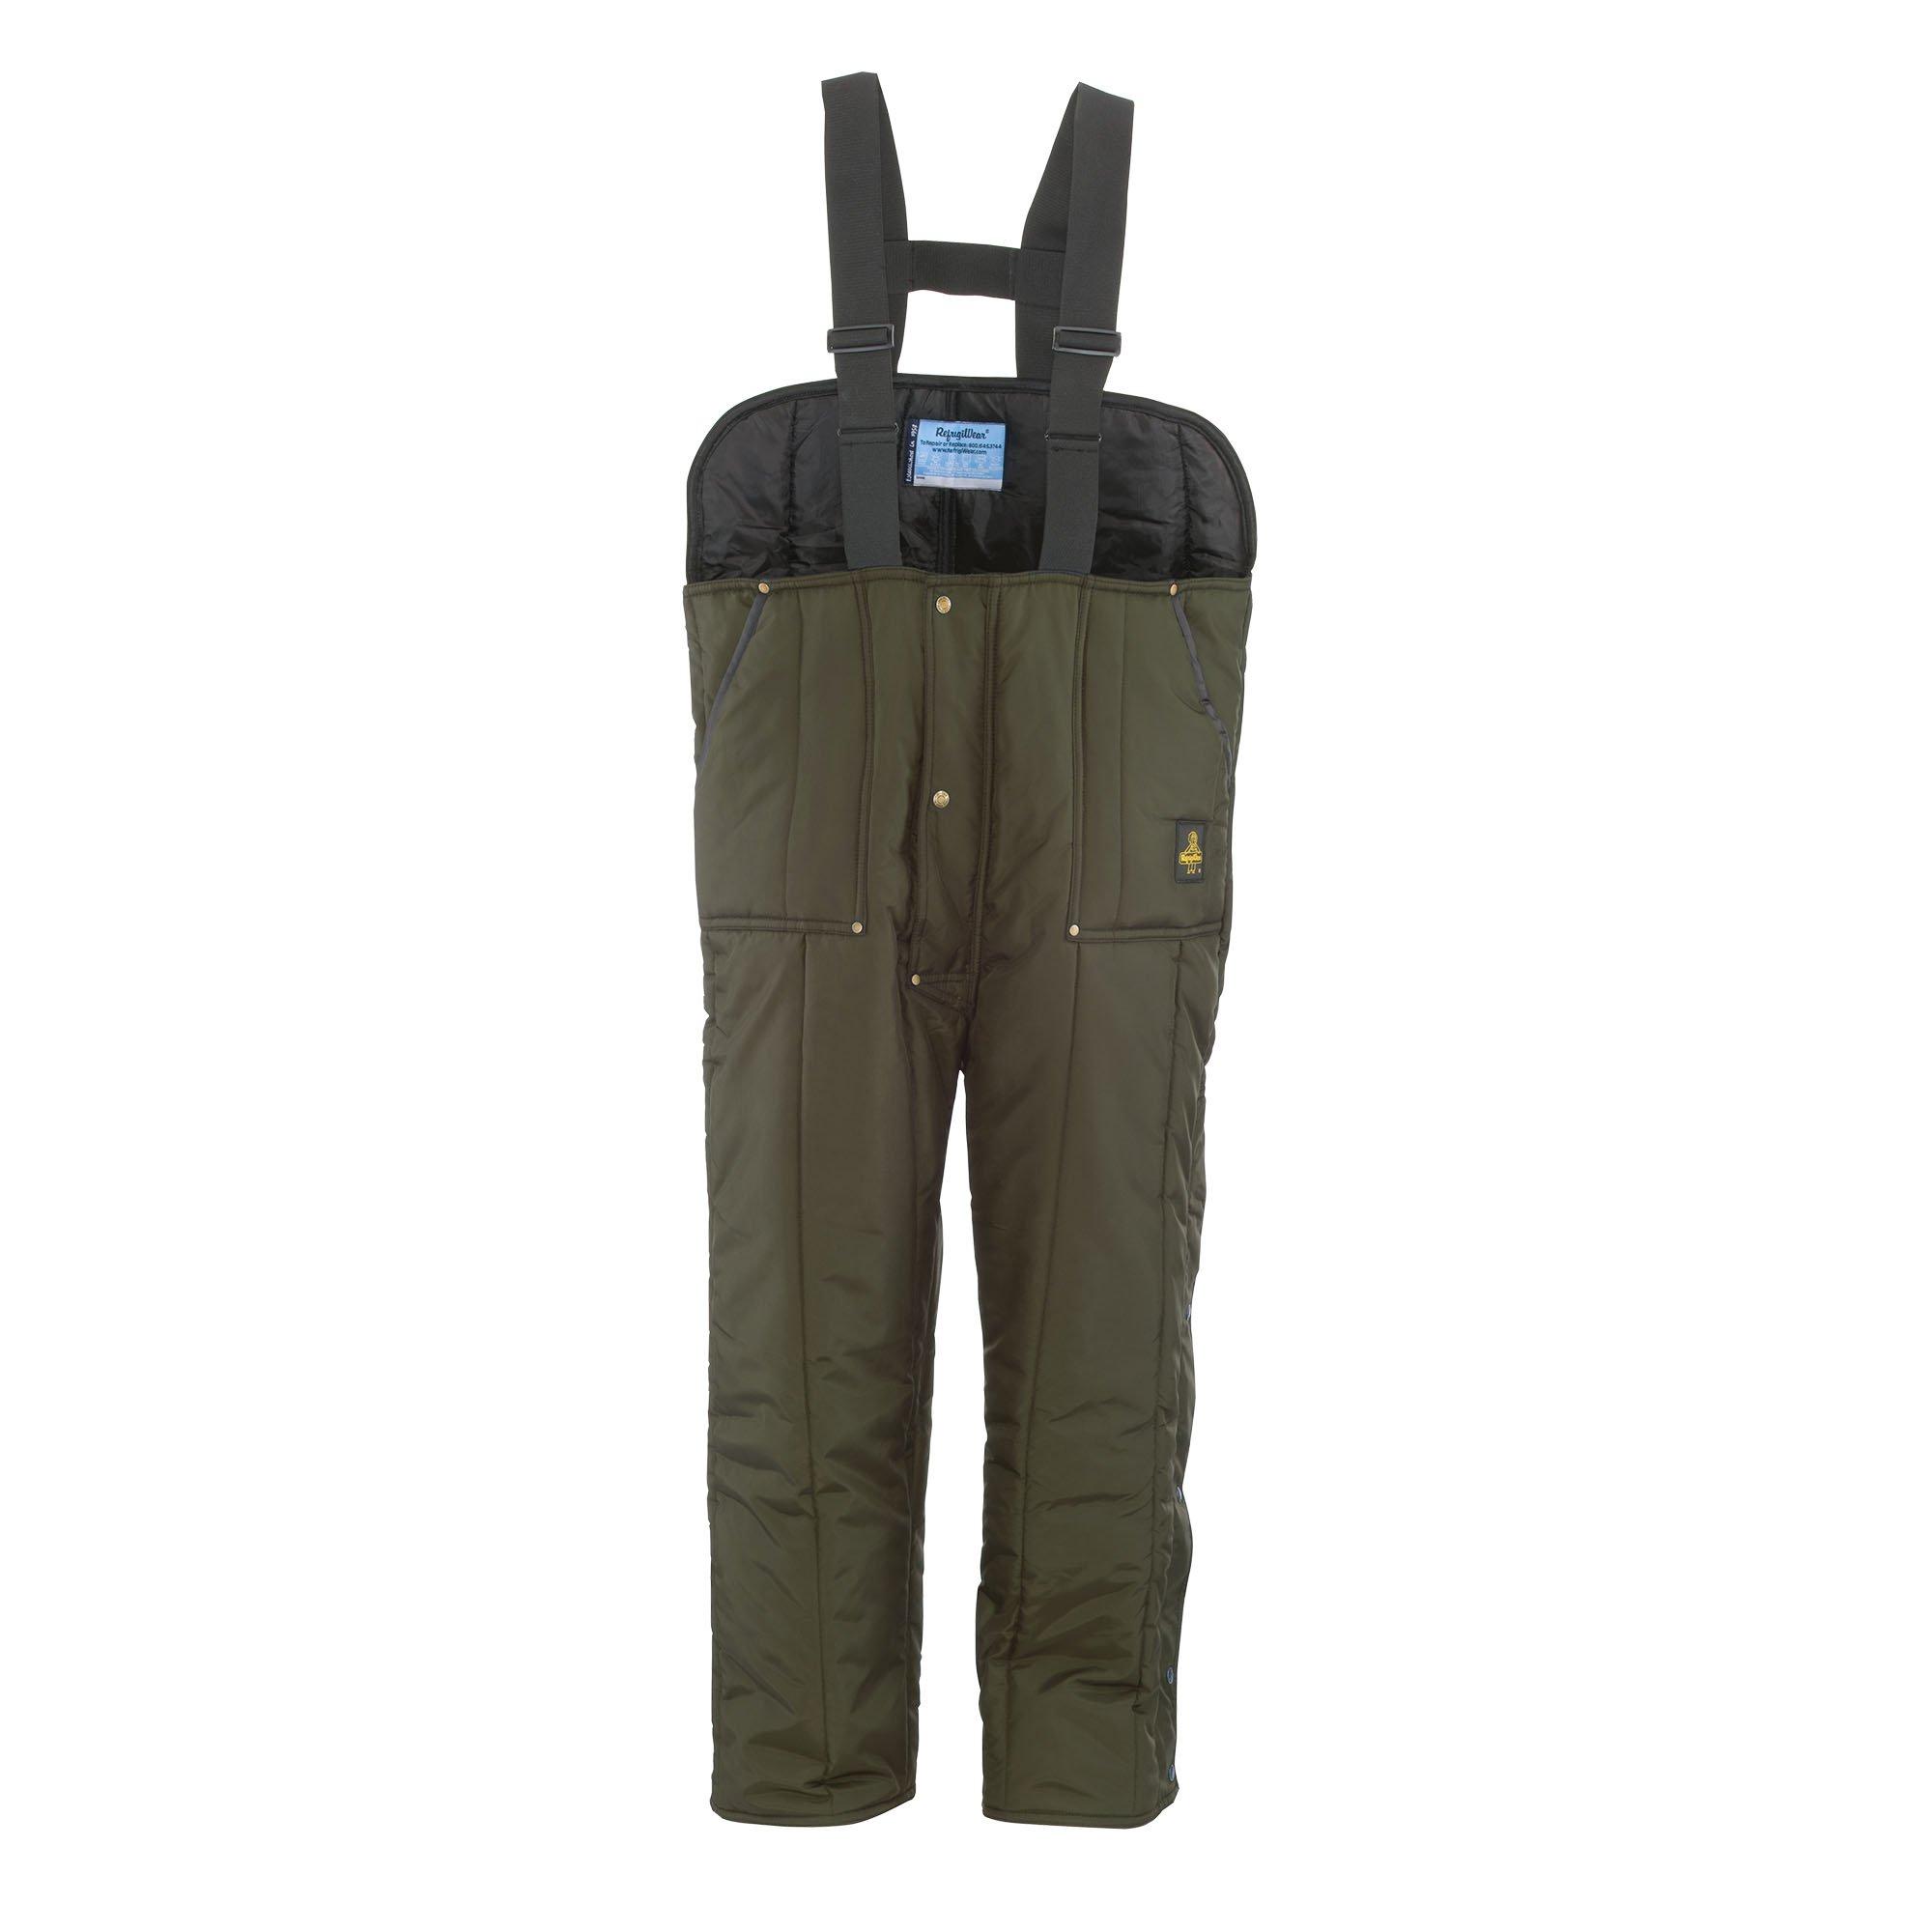 RefrigiWear Men's Iron-Tuff Low Bib Overalls, Sage, 4XL Short